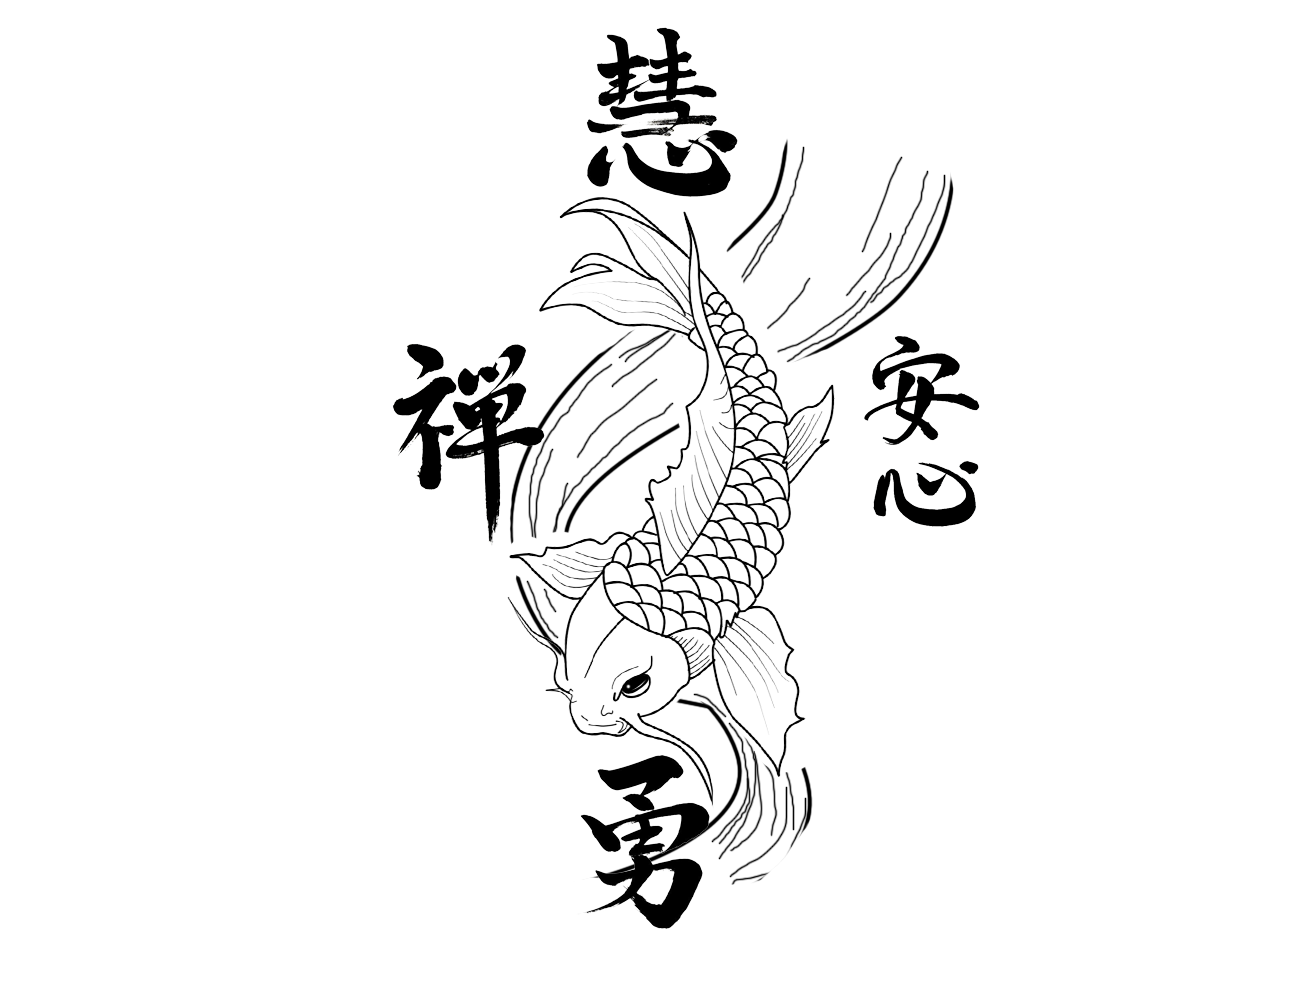 Koi Fish Tattoo Black And White